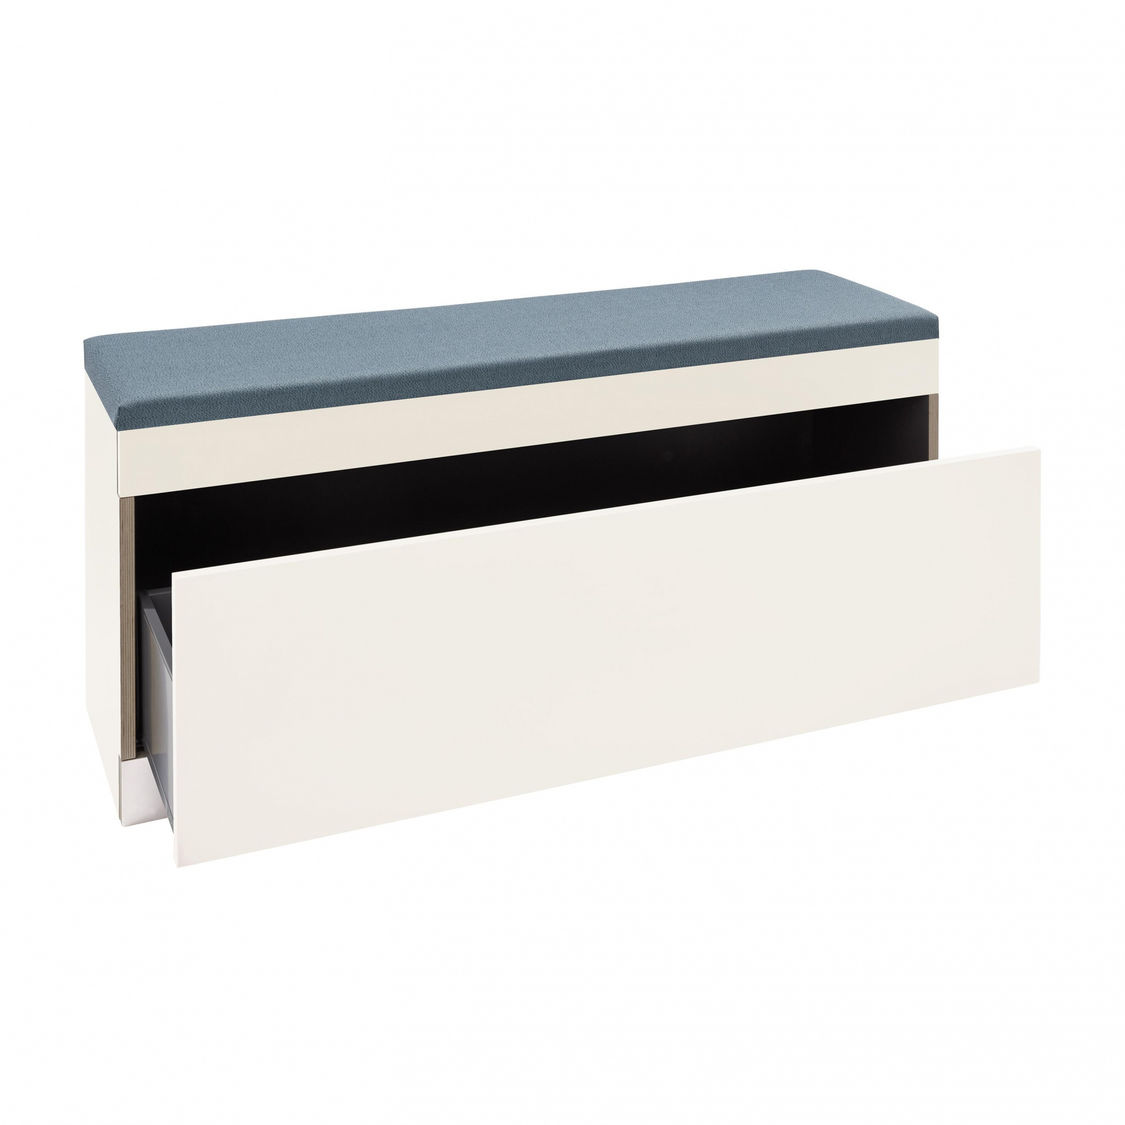 flai banc de stockage avec tiroir m ller m belwerkst tten. Black Bedroom Furniture Sets. Home Design Ideas